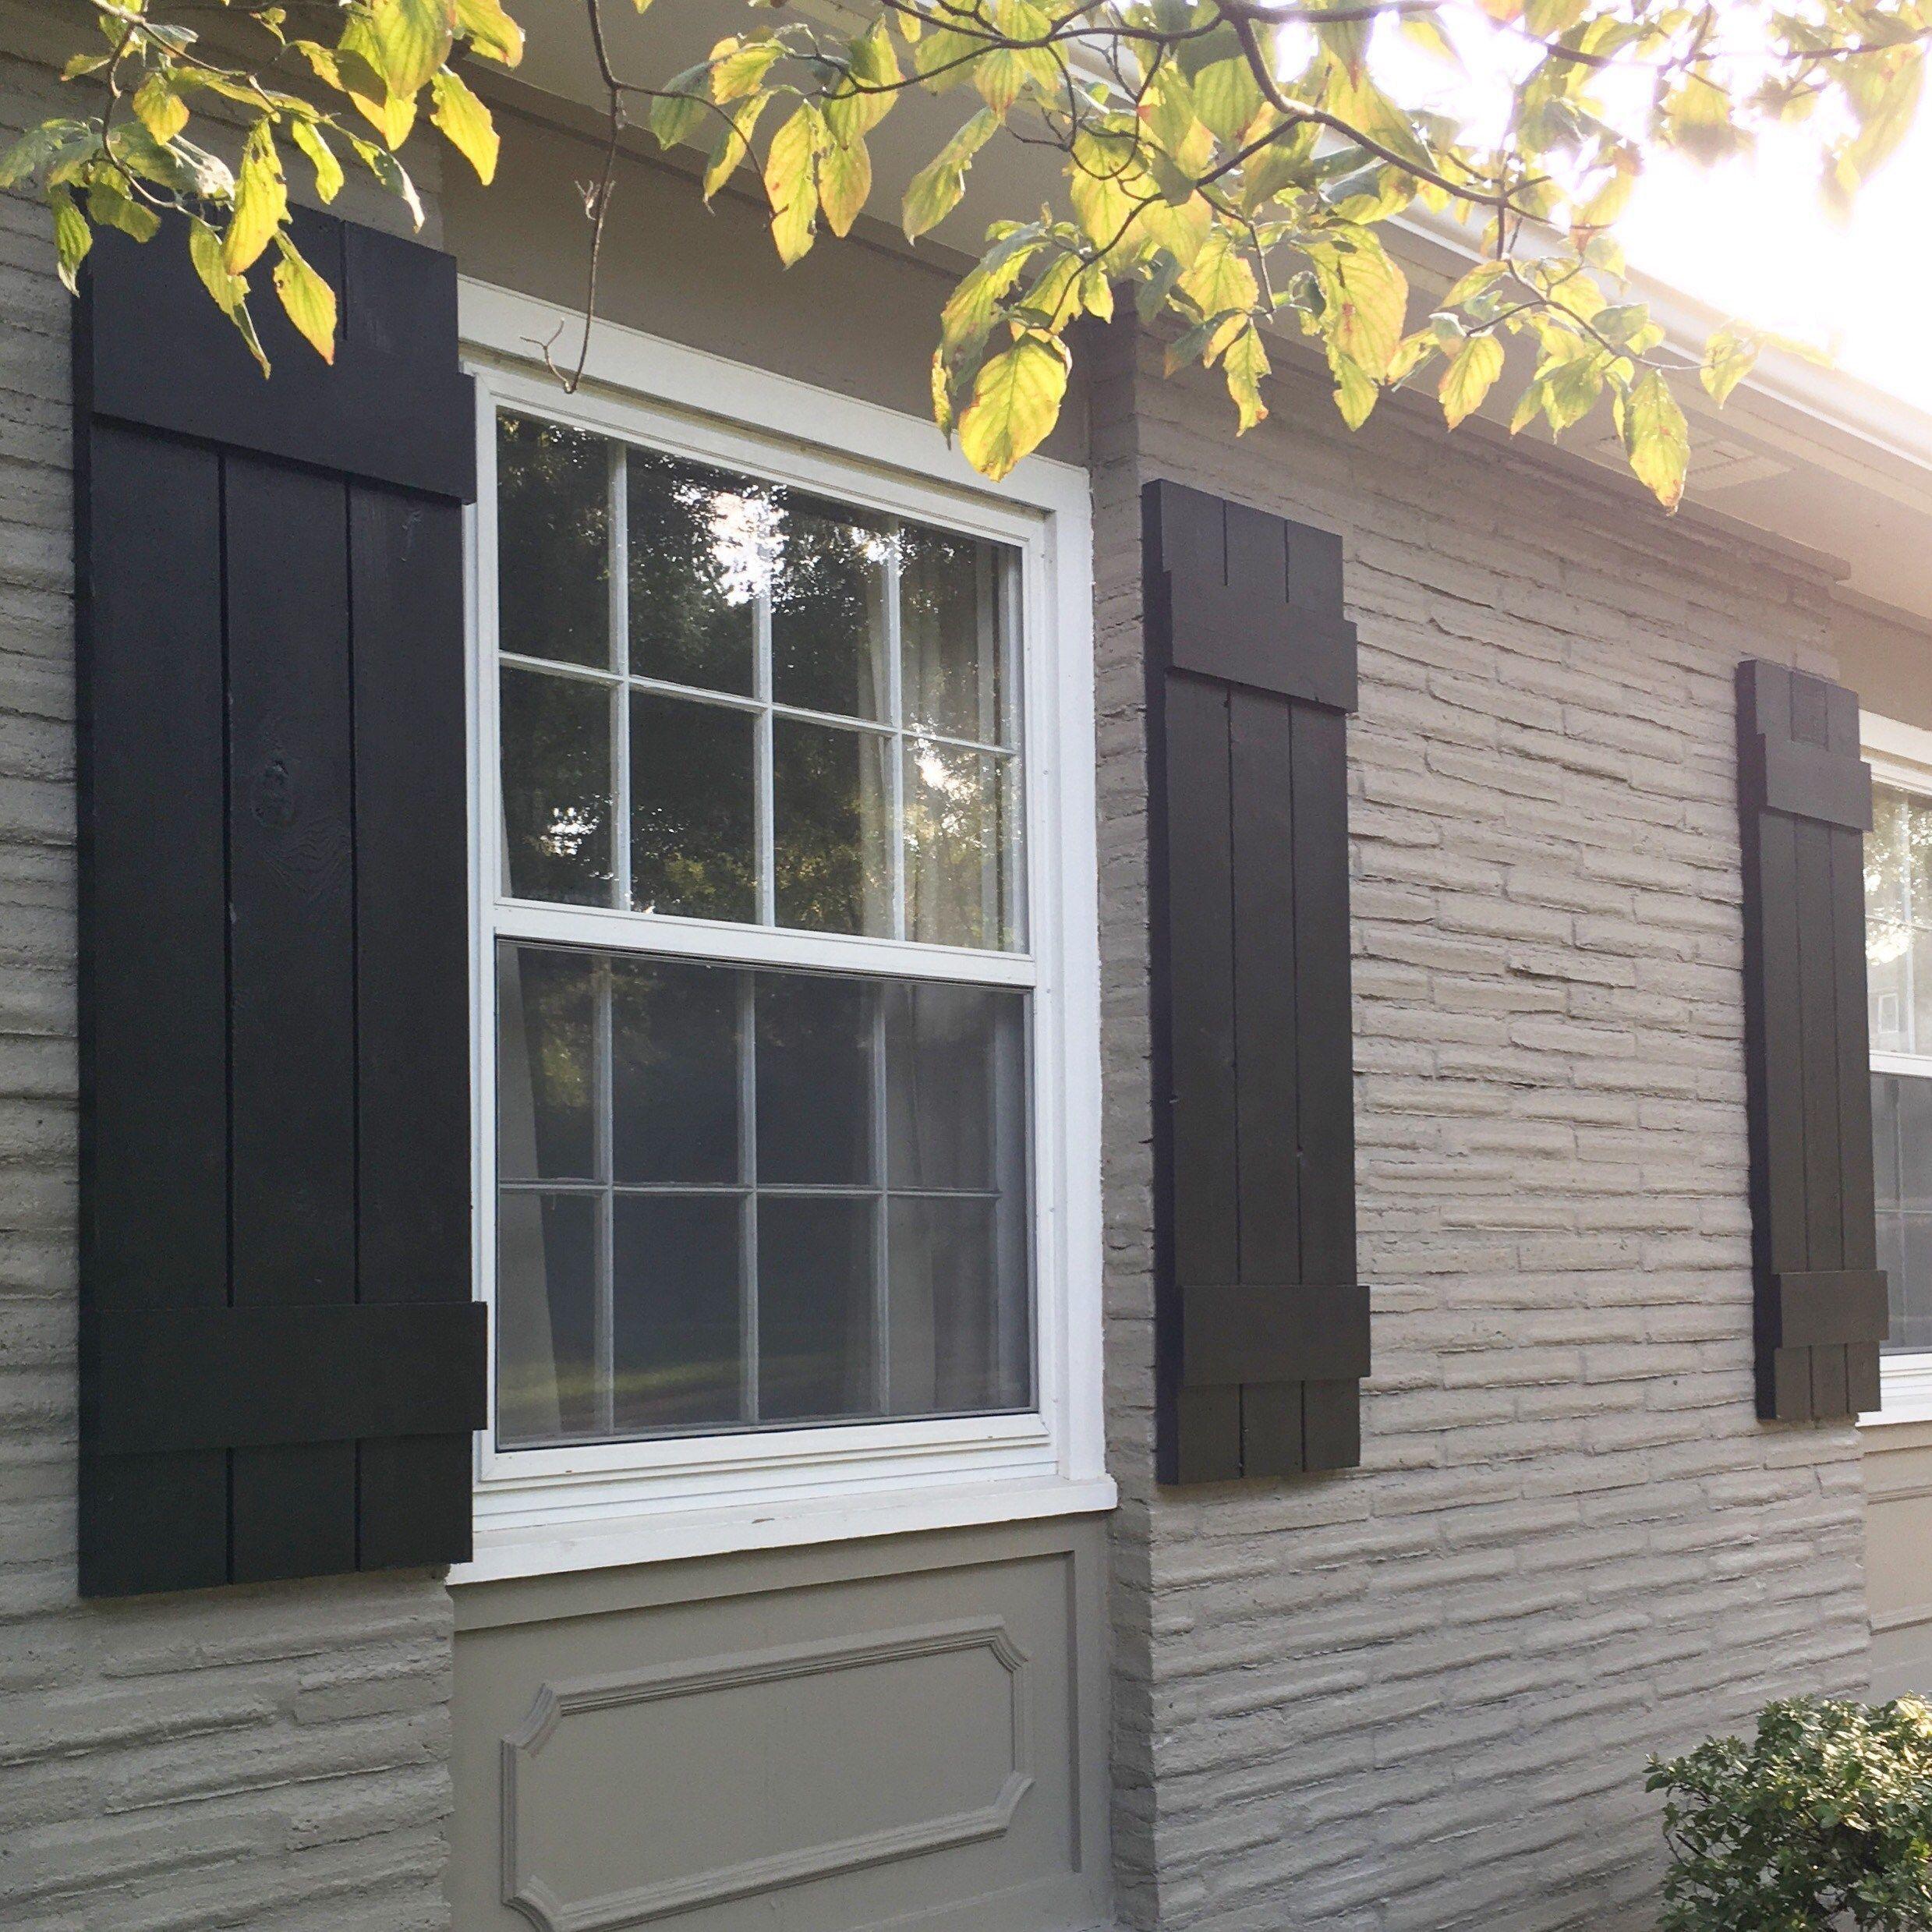 Diy Window Shutter Craftsman Exterior Shutters Exterior Window ...